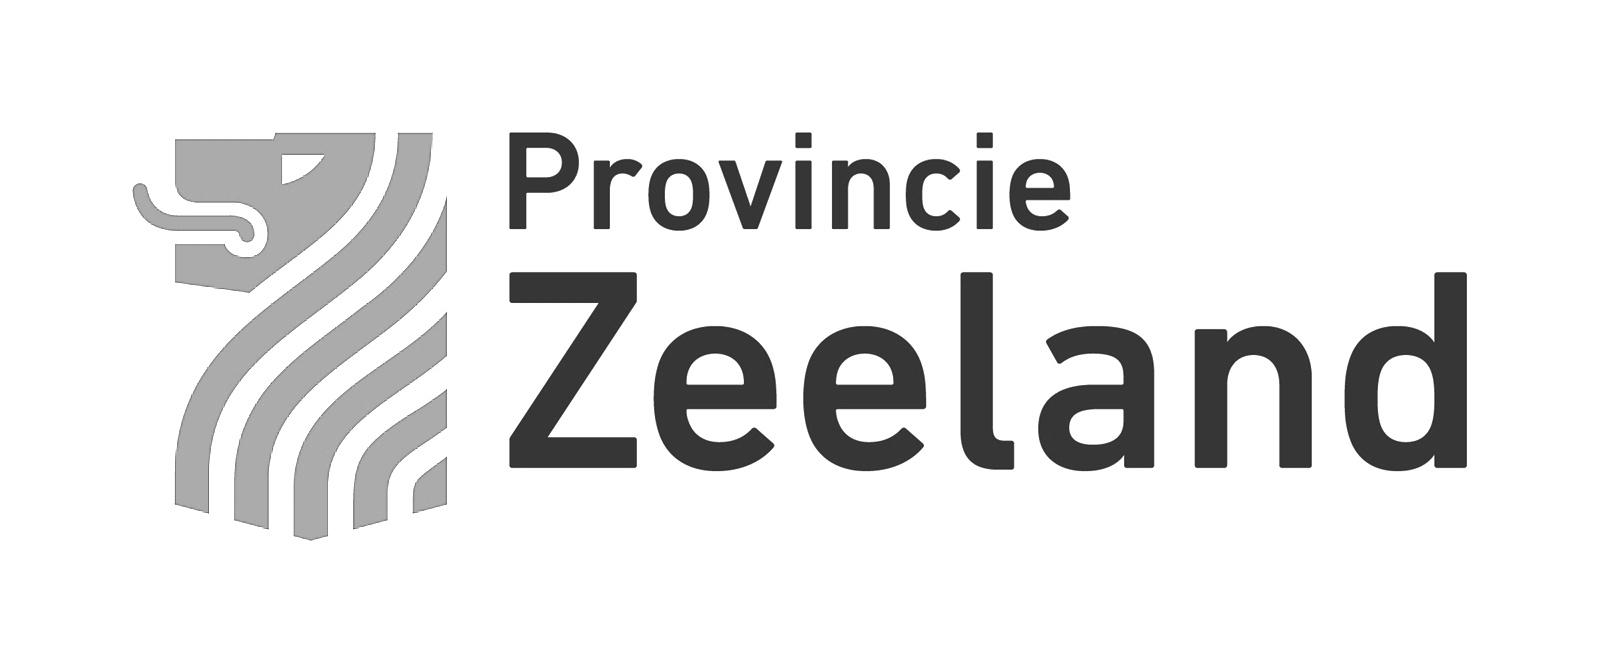 Provincie Zeeland logo.jpg